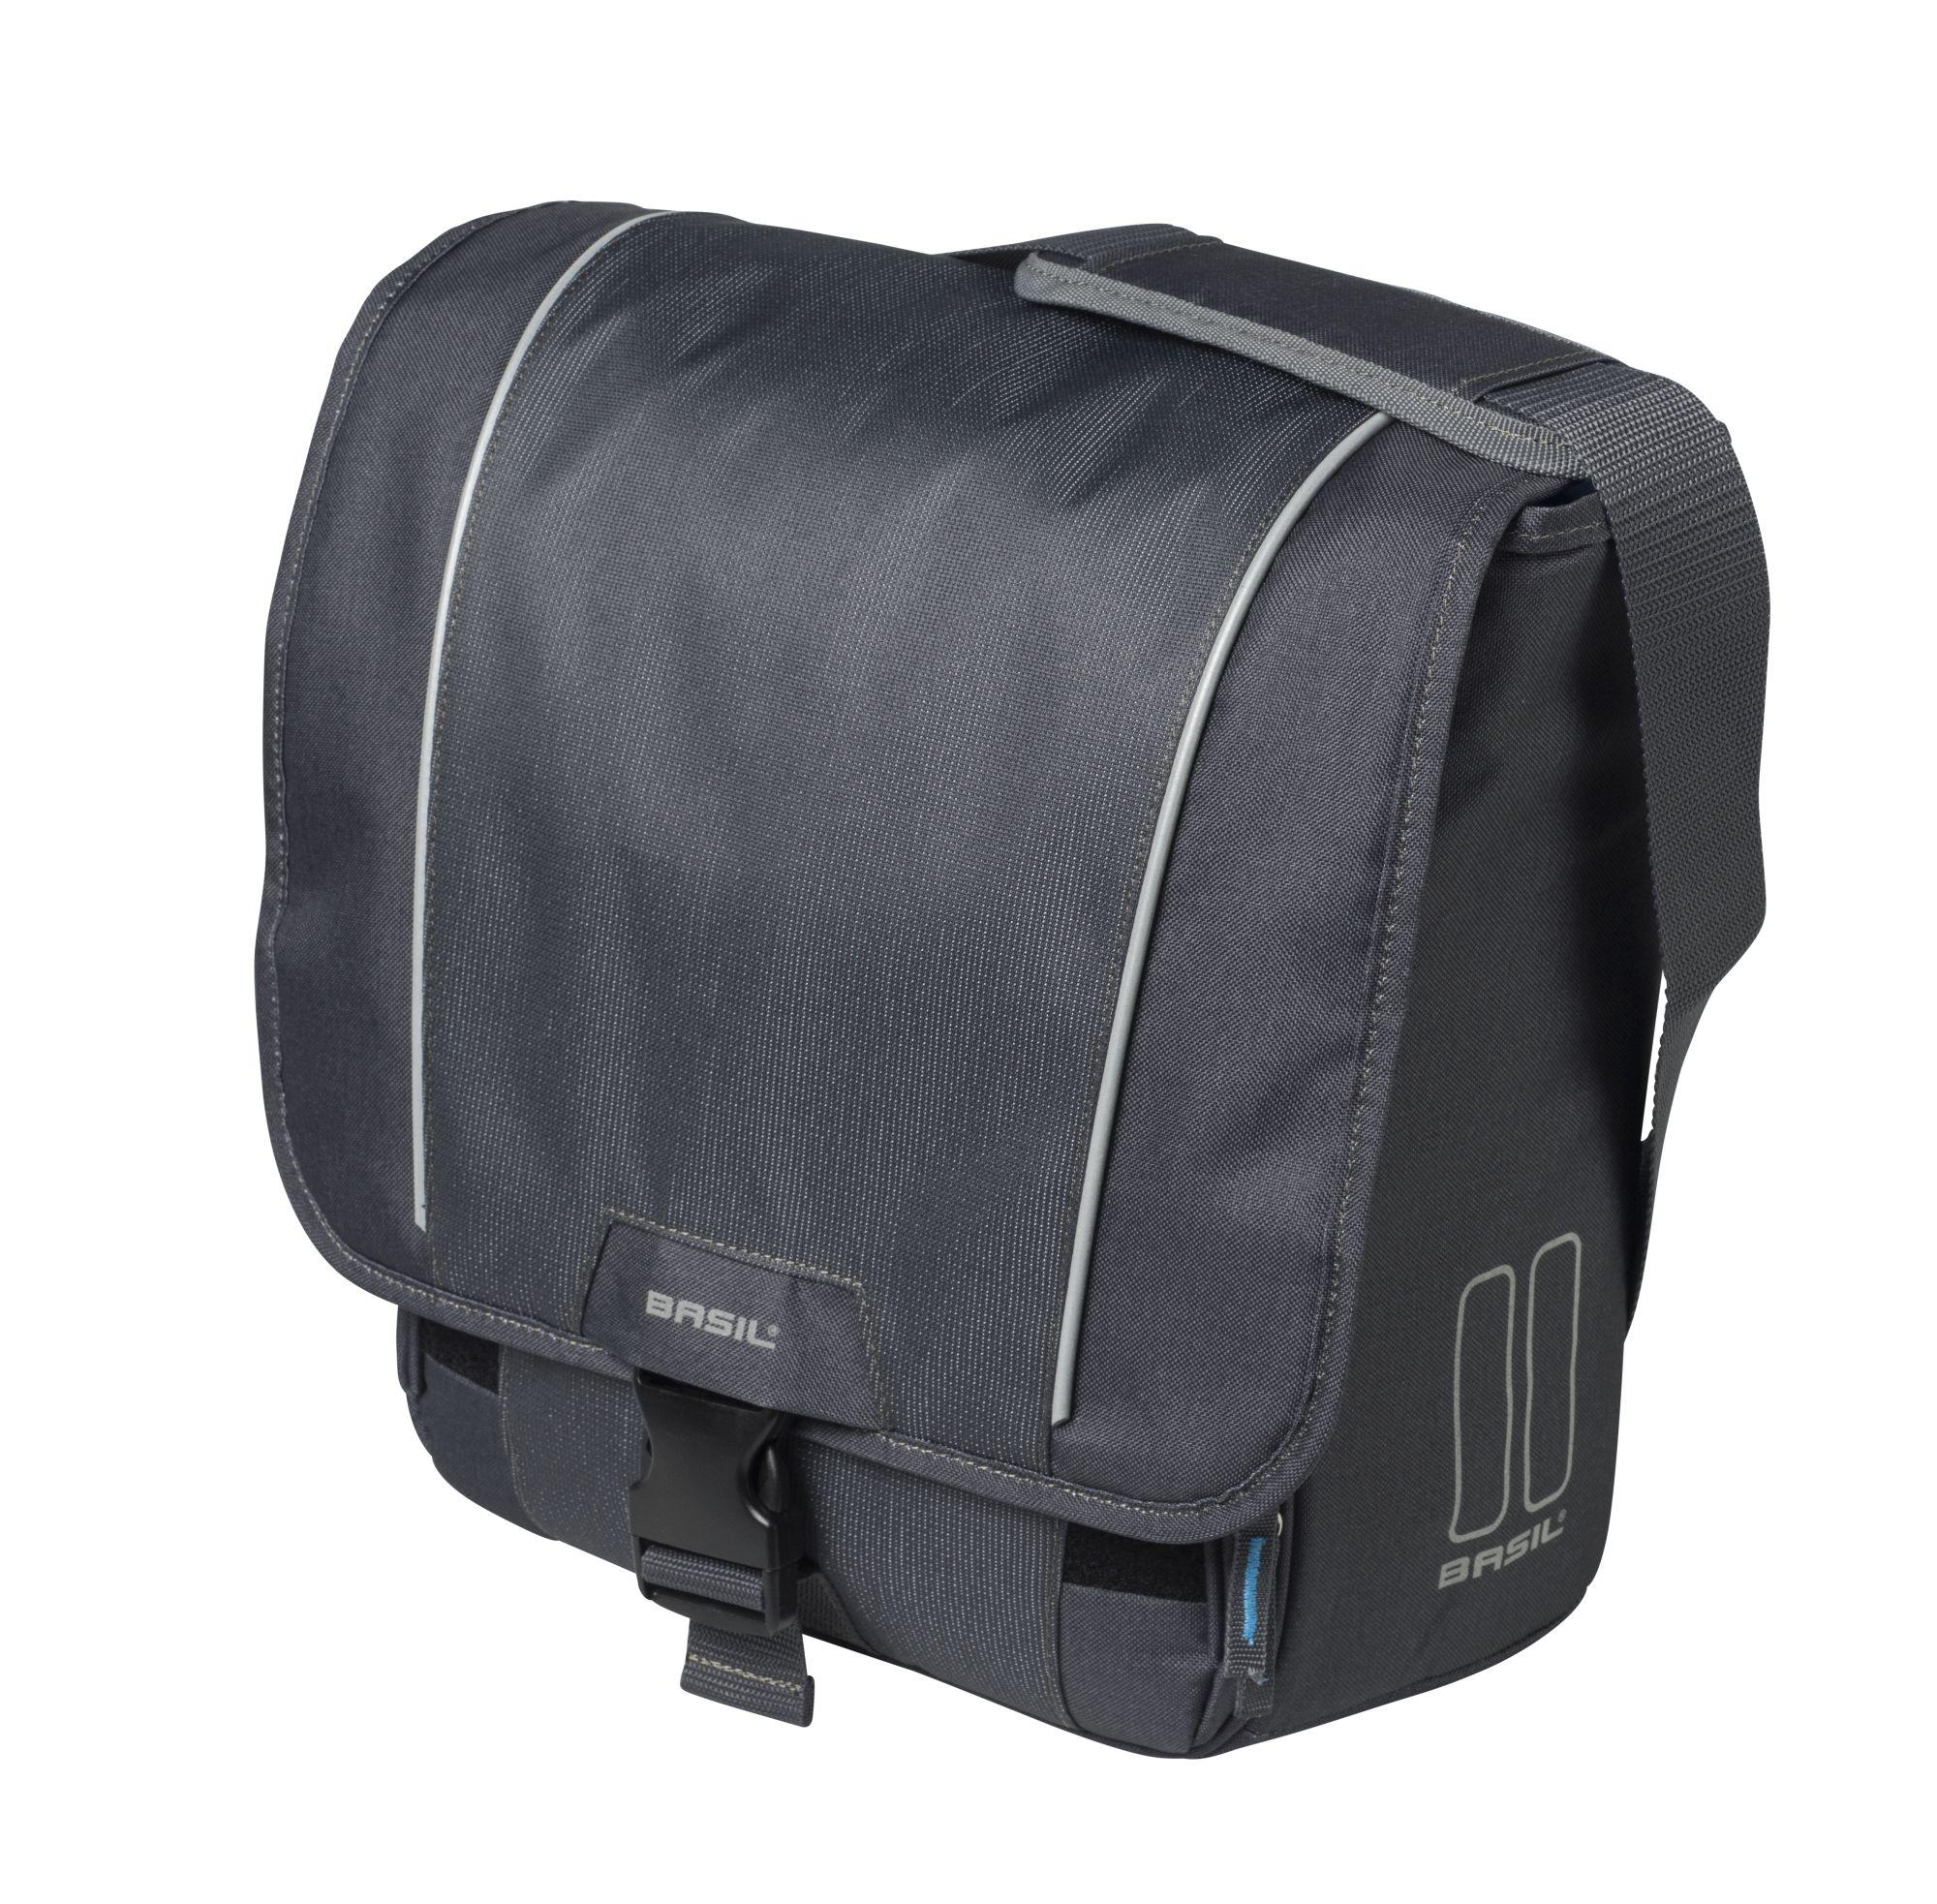 Basil Fahrrad-Schultertasche graphite Sport Design Commuter Bag